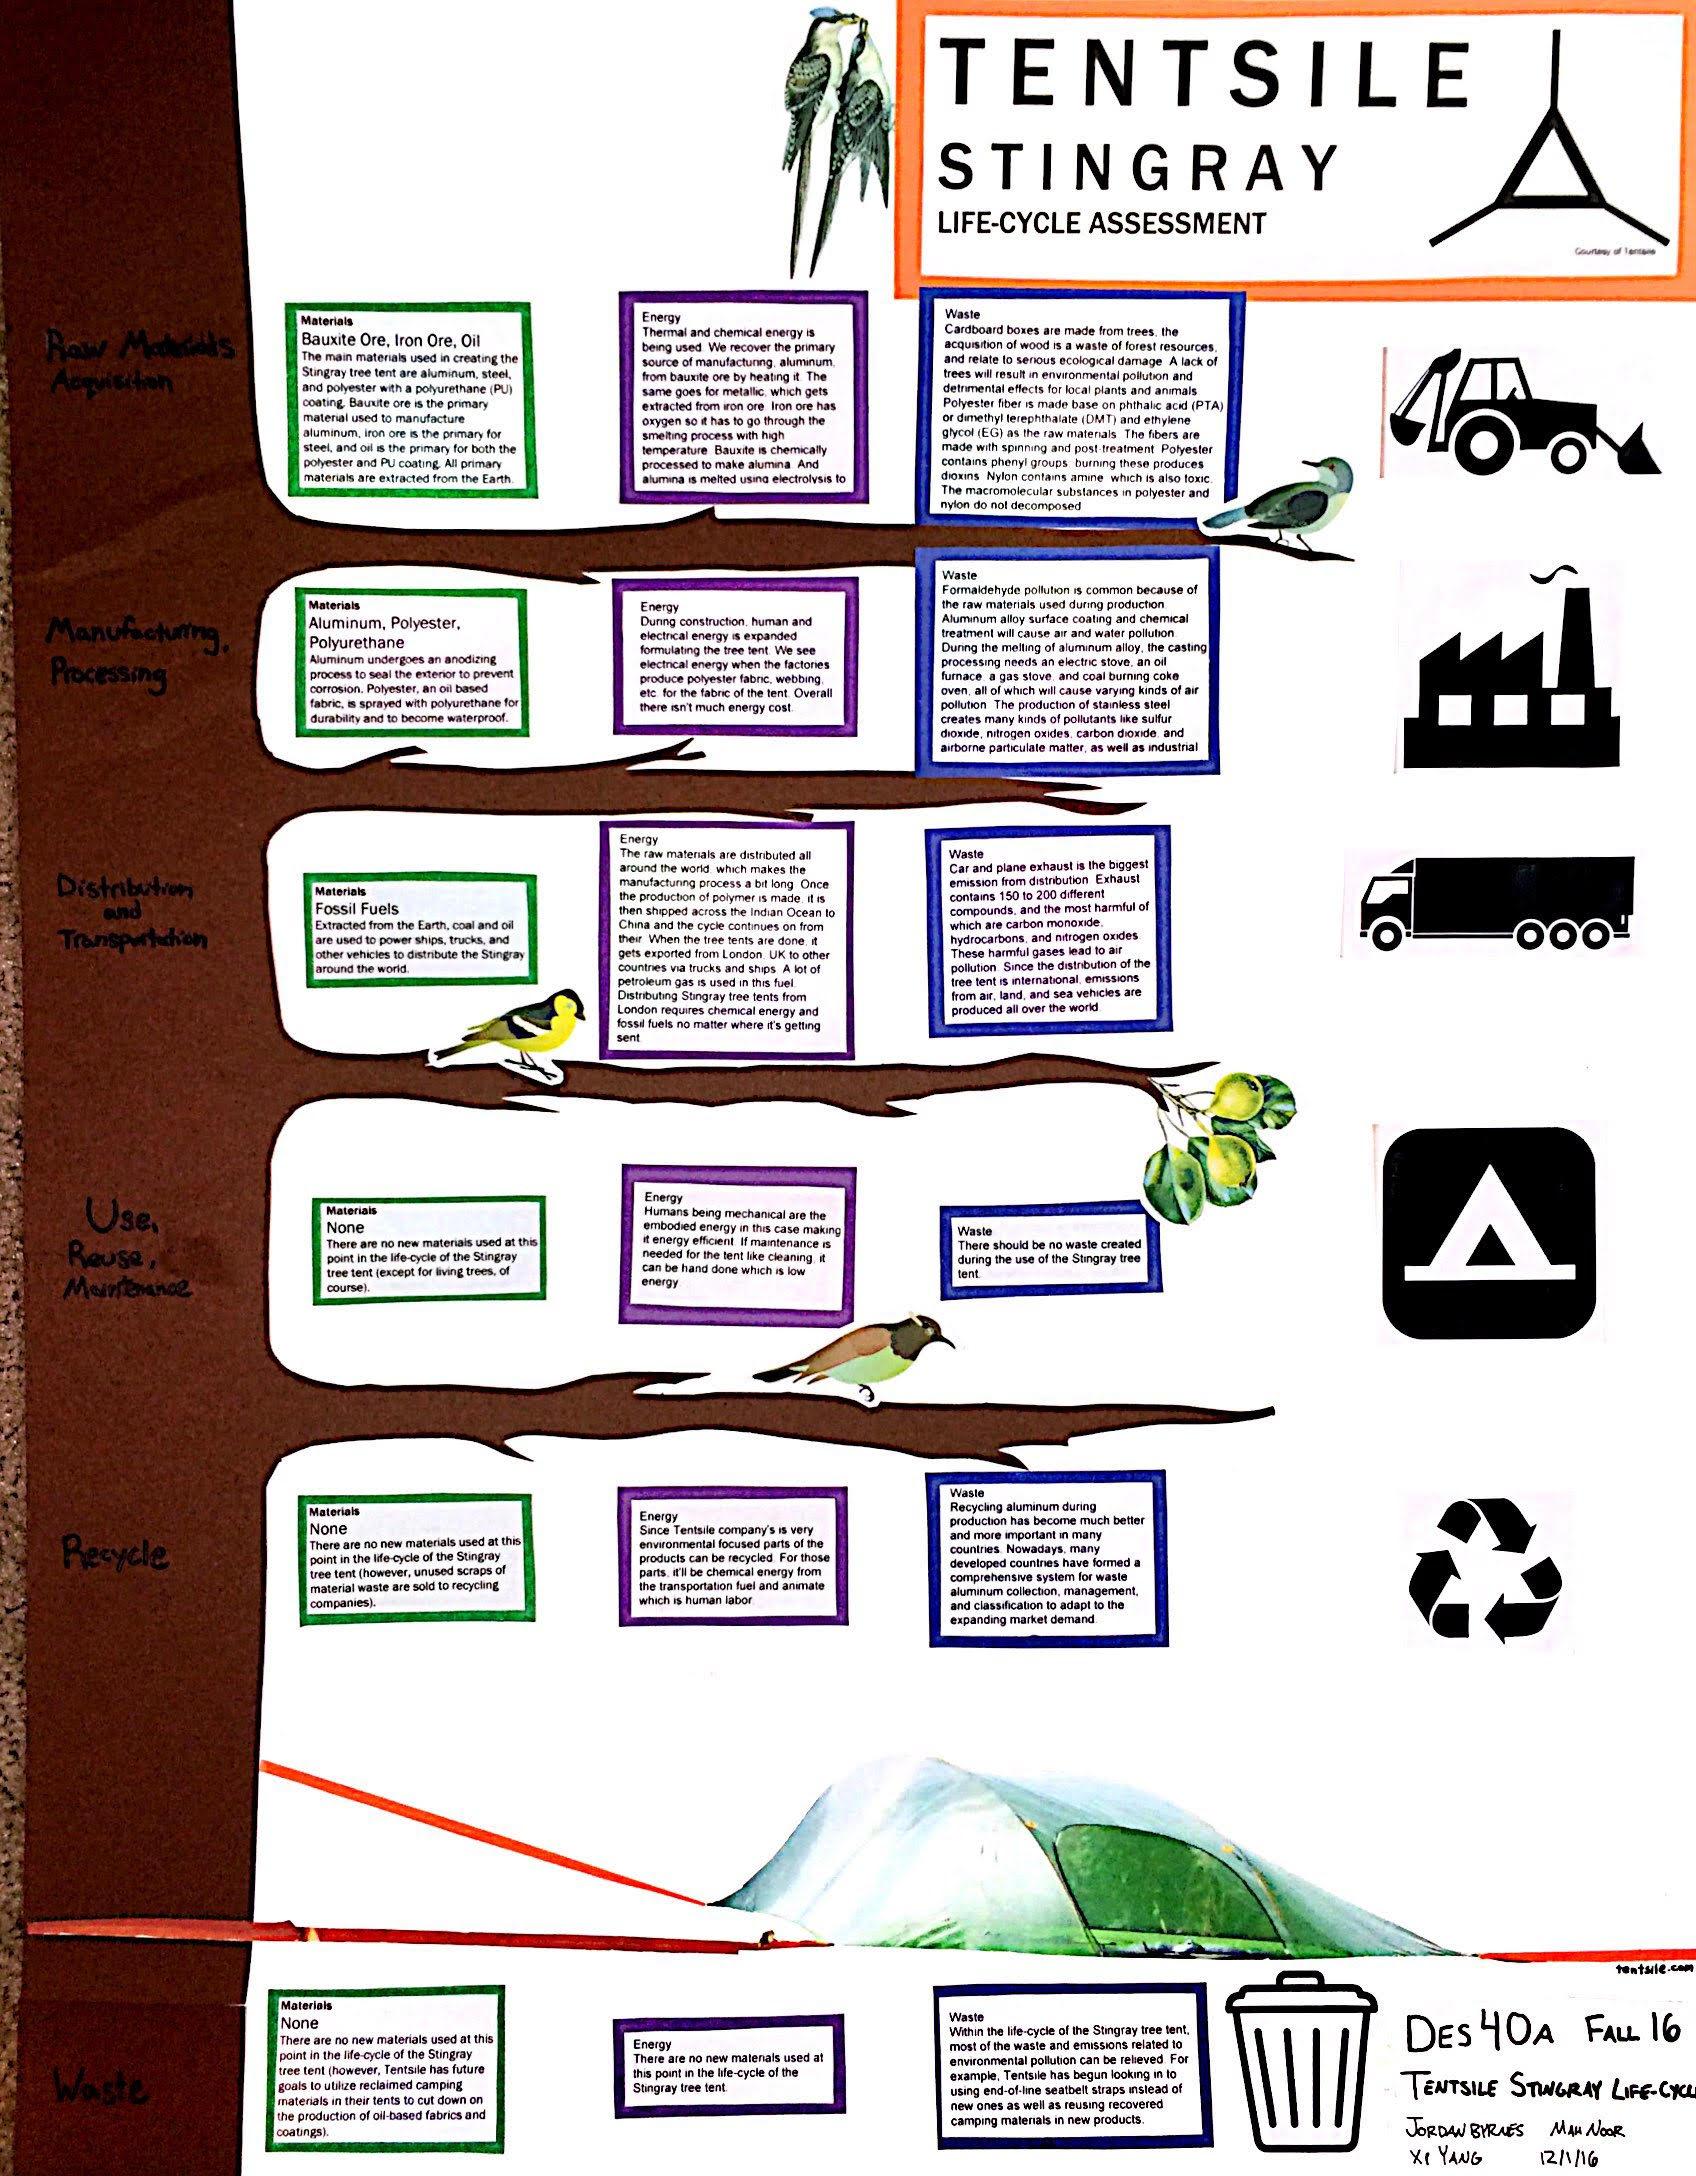 Tentsile Stingray Tree Tent — Design Life-Cycle